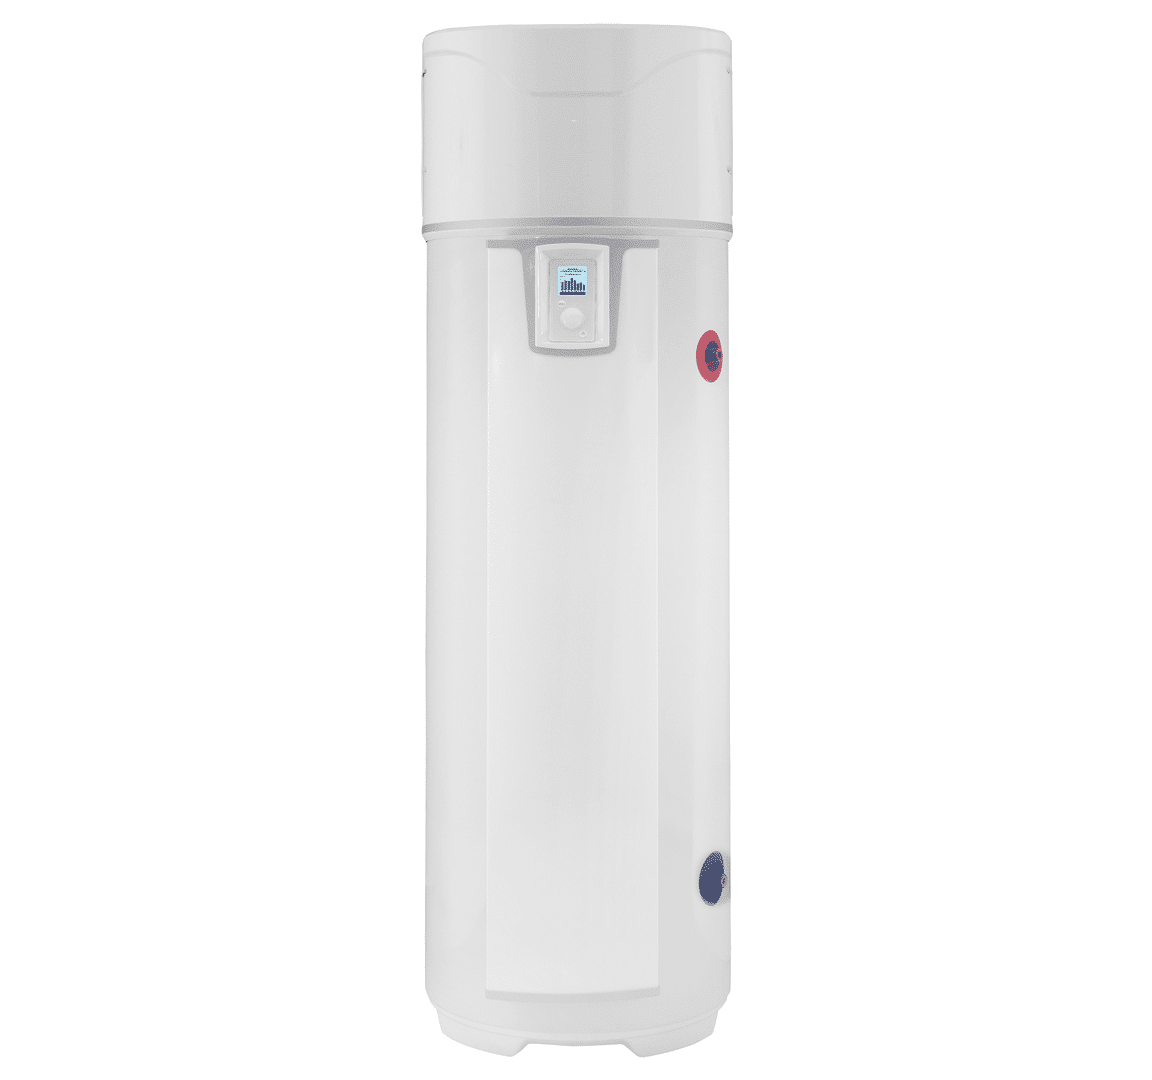 Afbeelding van Panasonic warmwaterboiler